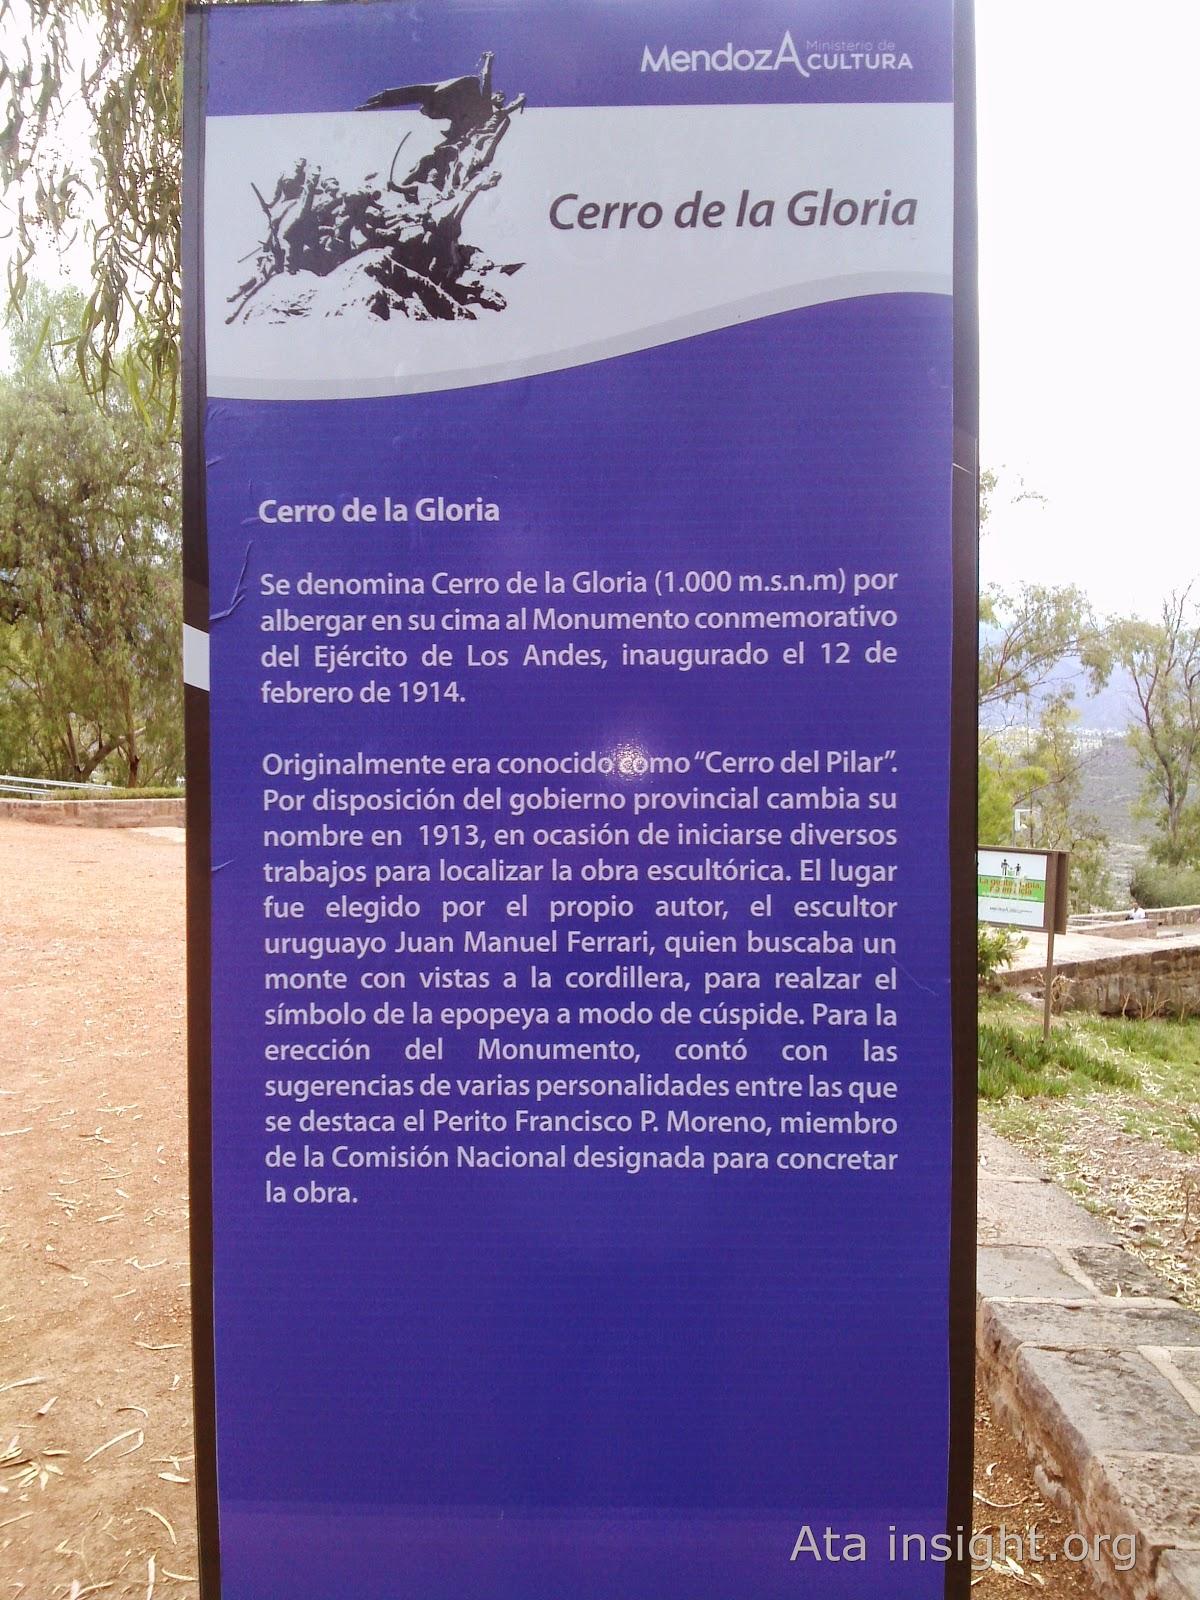 Cerro de la gloria Mendoza